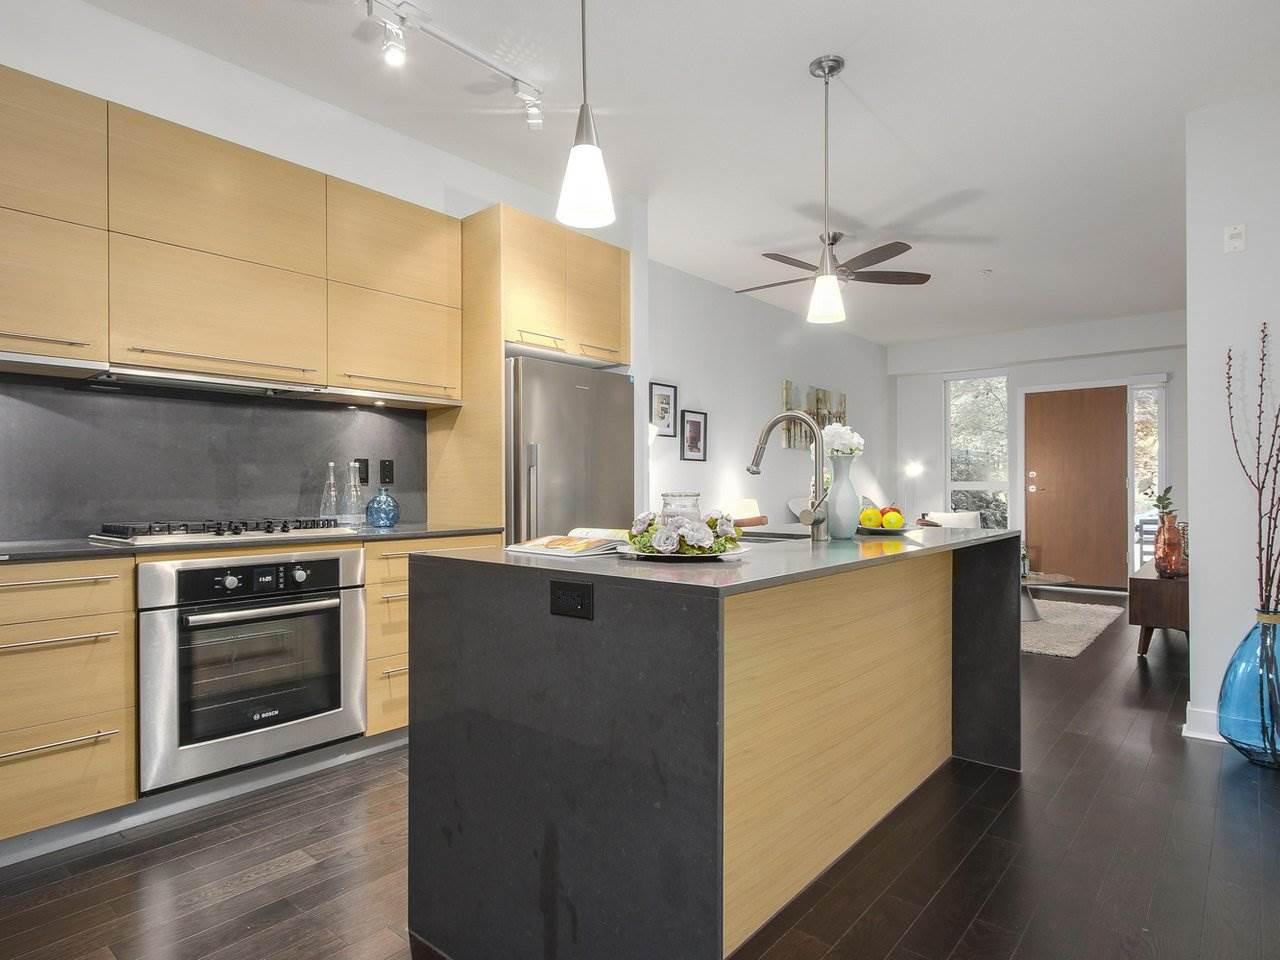 Sold: 105 - 2020 W 12th Avenue, Vancouver, BC